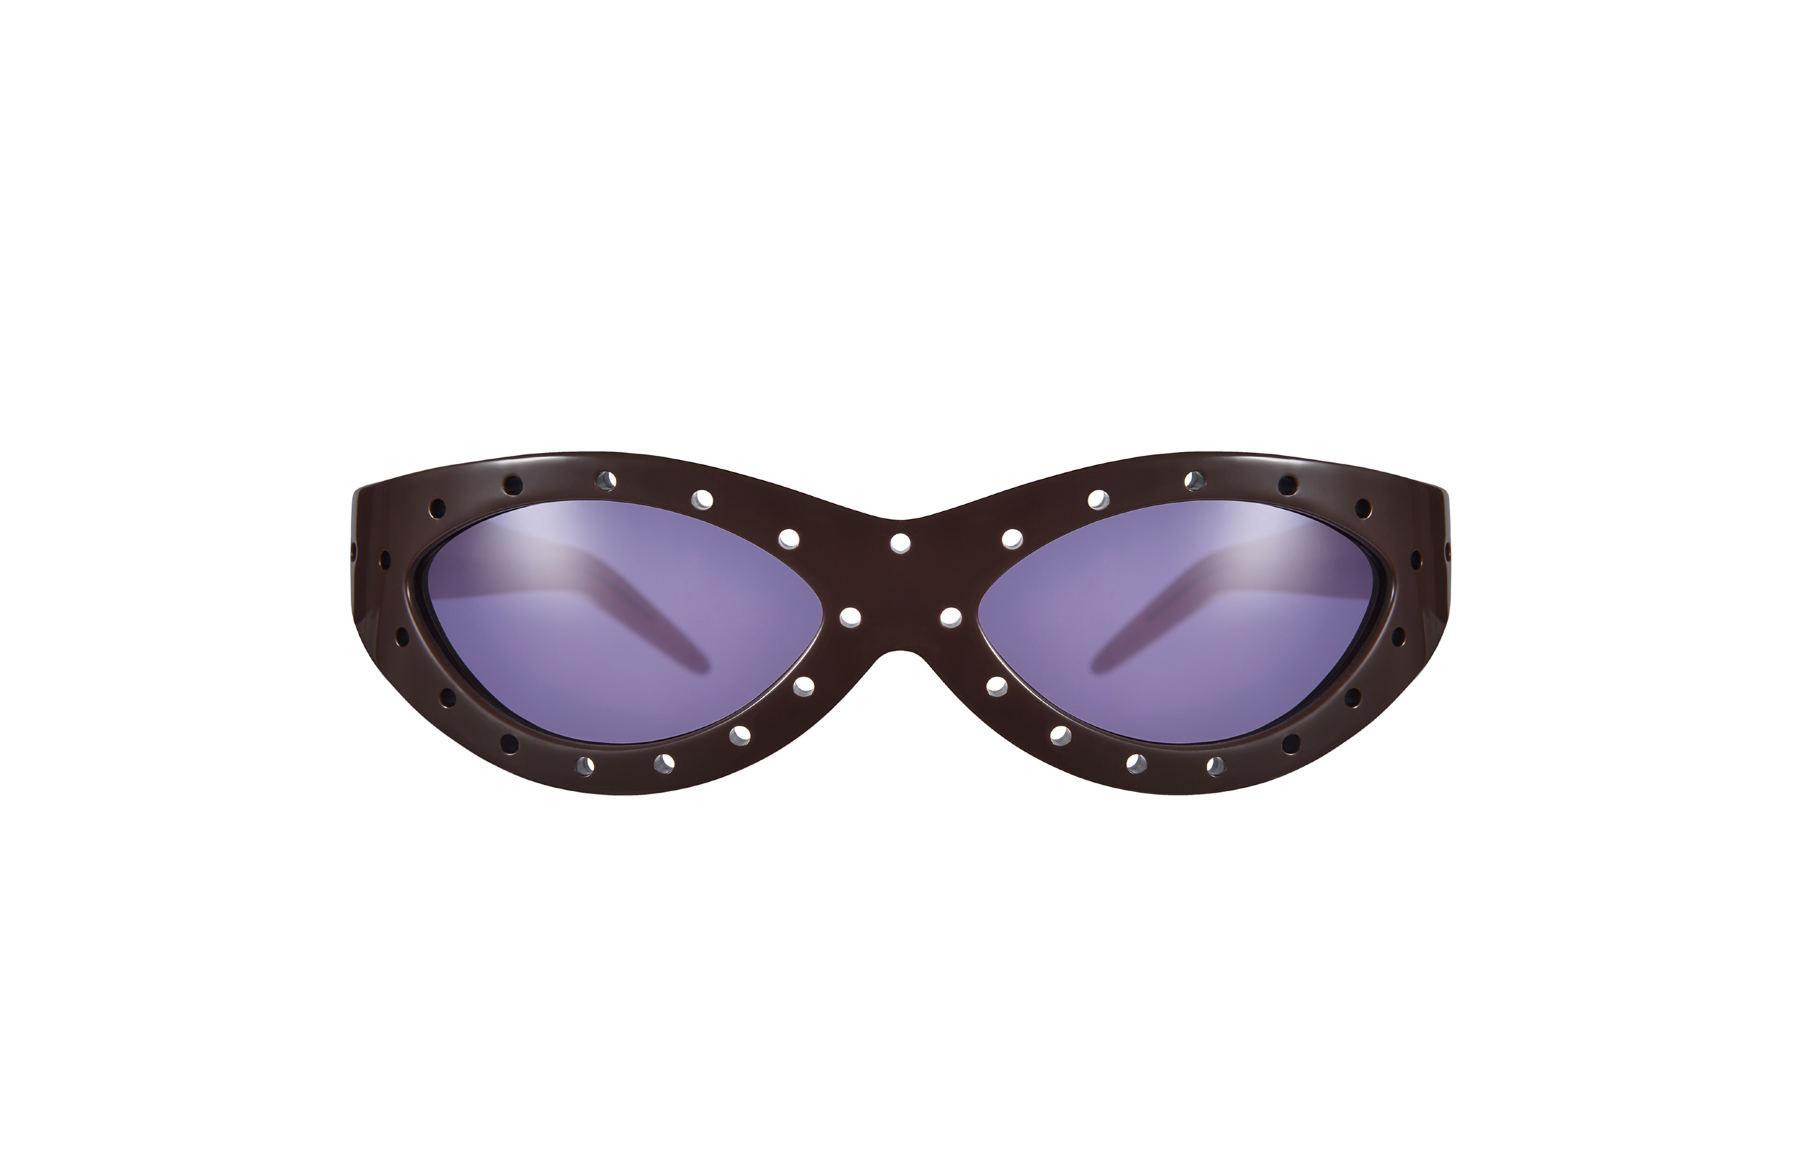 FAKBYFAK x Walter Van Beirendonck  Toy Glasses Model 1. Dark brown with coloured pins Code: 09/01/02